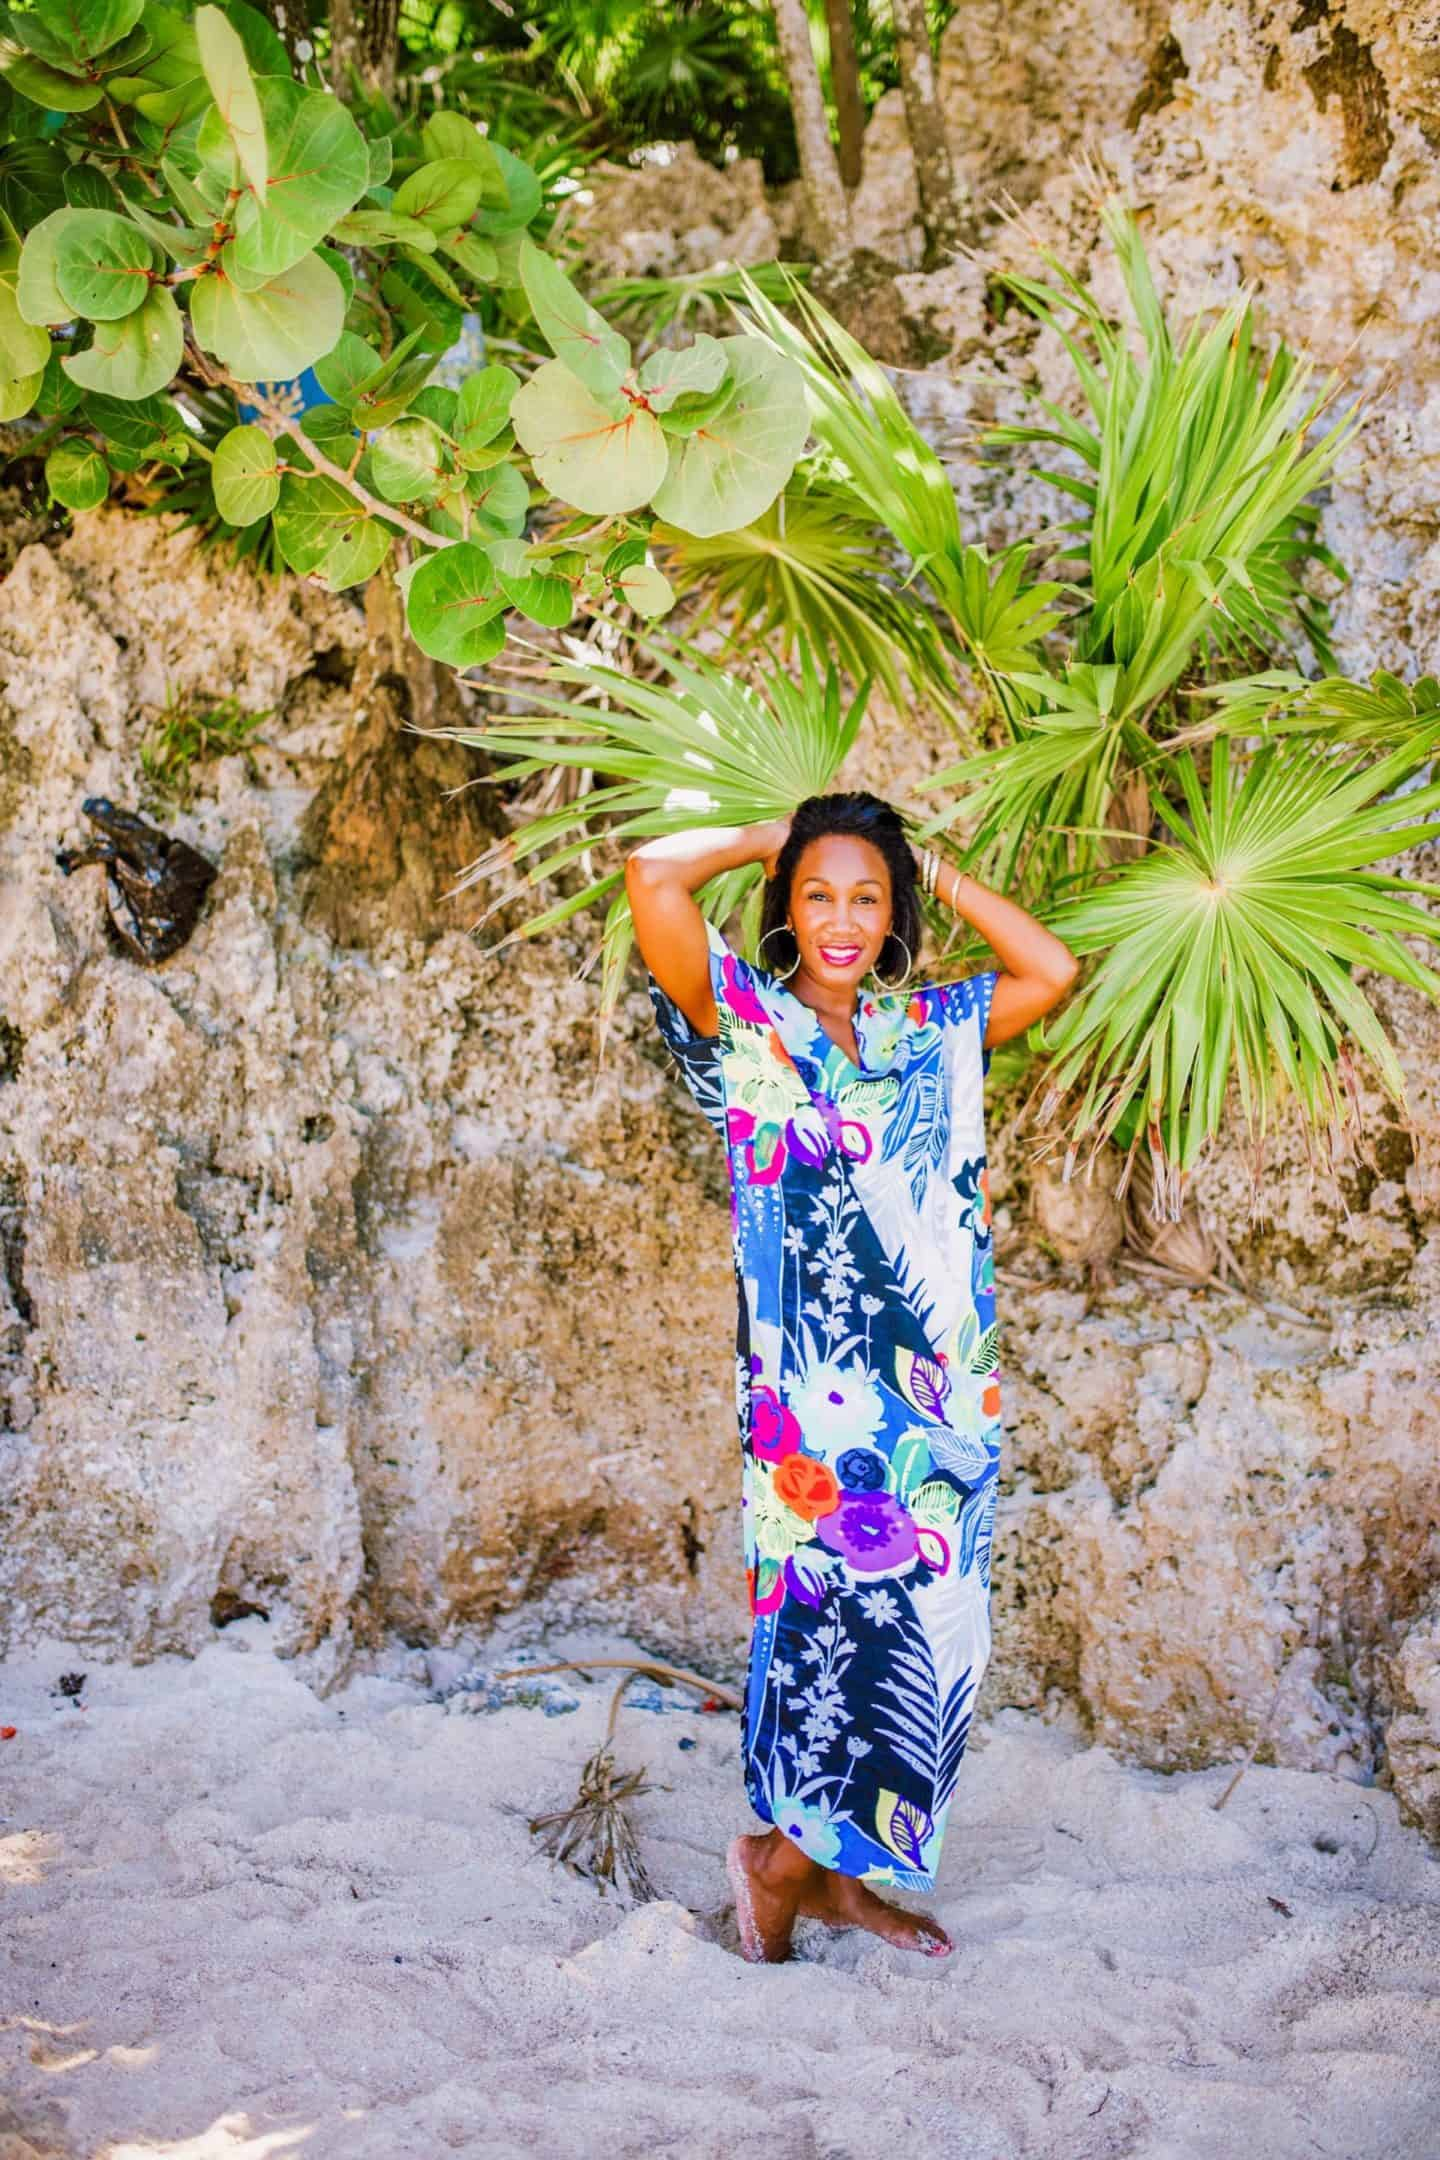 Shaunda Necole- Western Caribbean queen in Jams Word - She Jams Around The World - the beaches of Isla Roatan